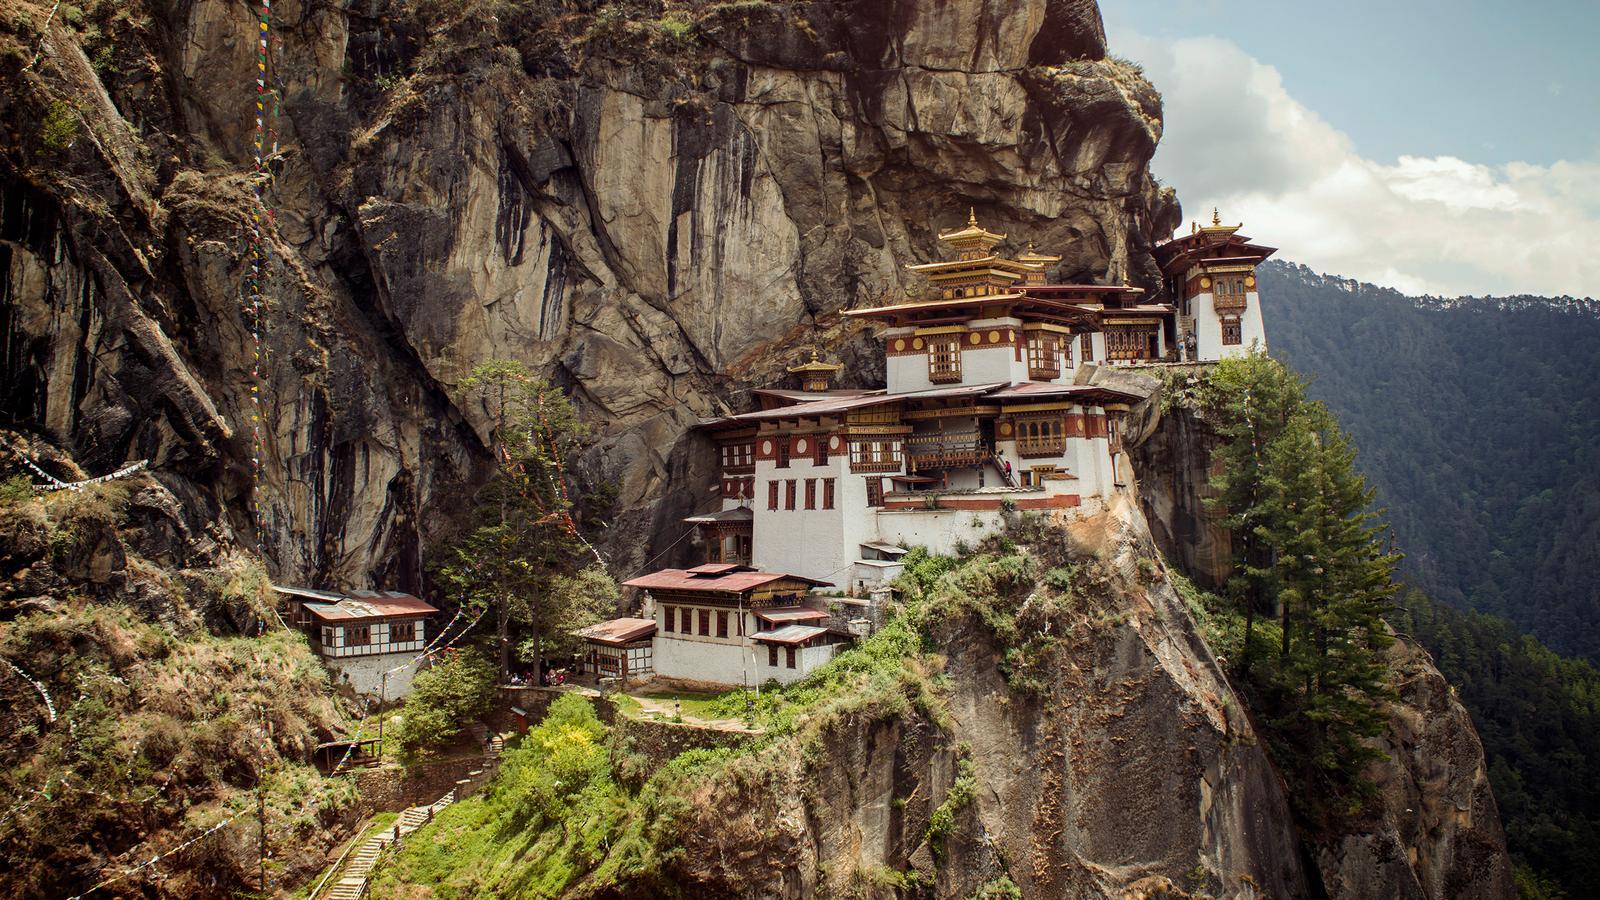 Bhutan Trekking The Druk Path In Bhutan Asia G Adventures